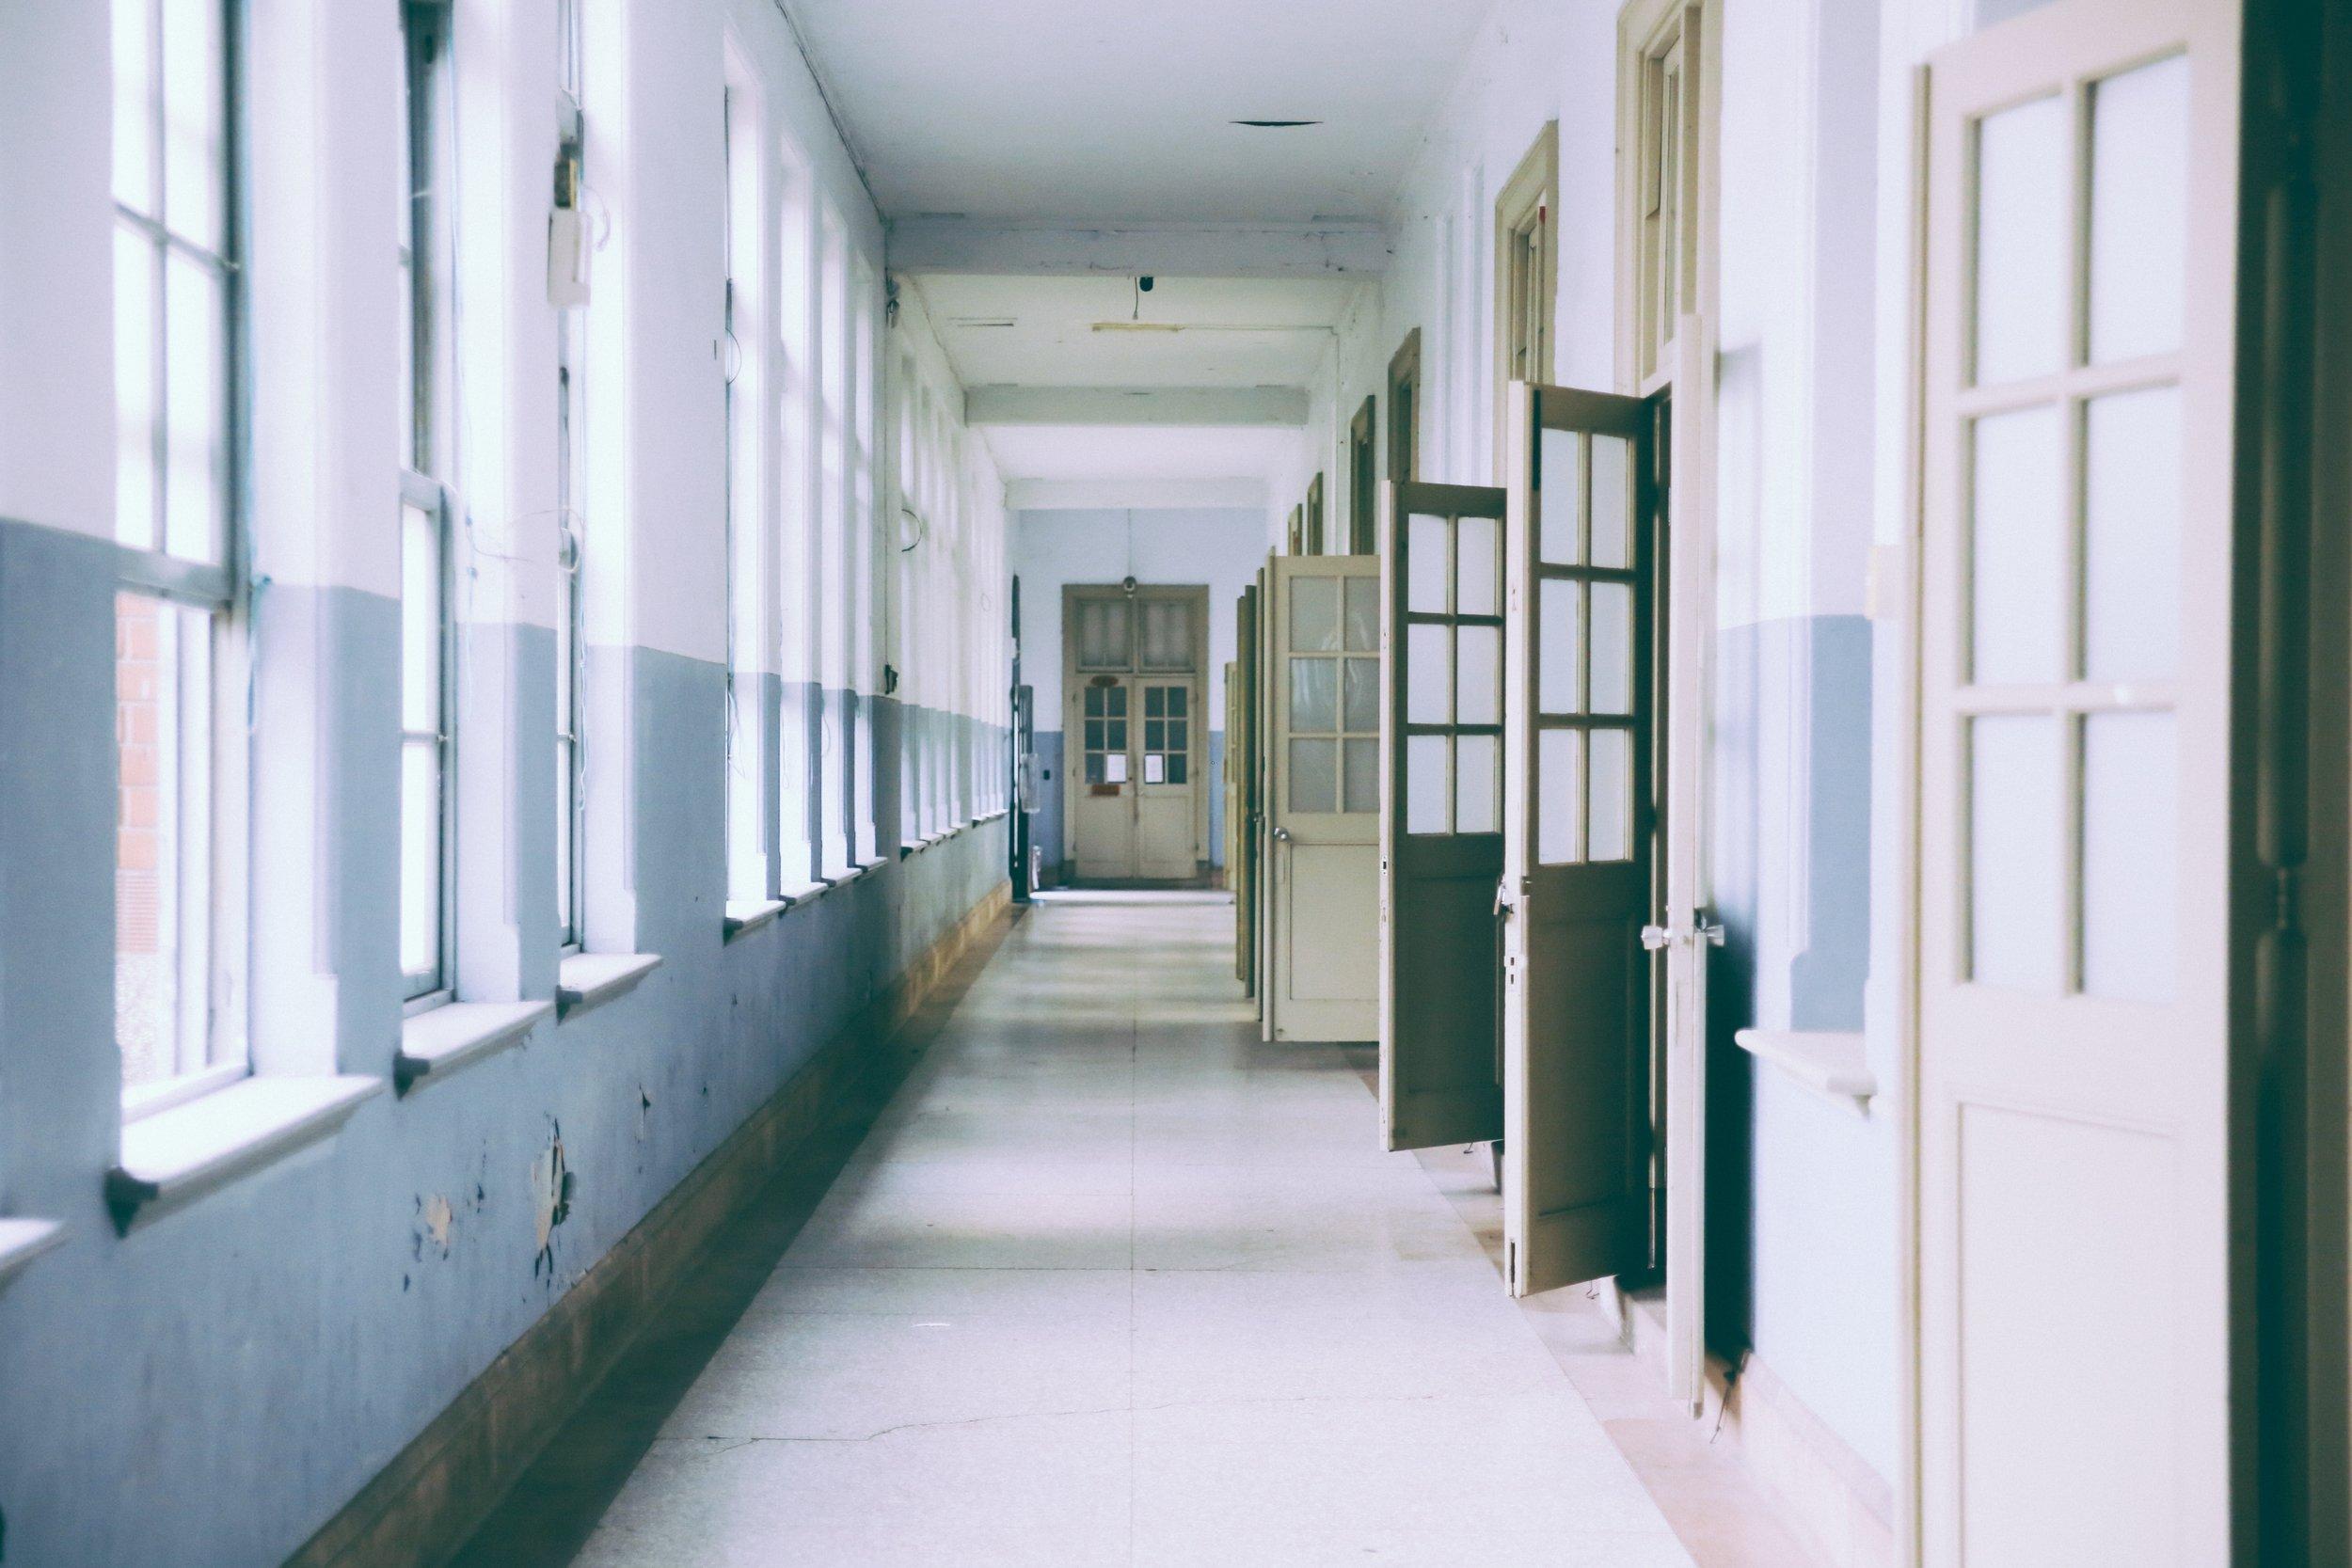 building-ceiling-classroom-373488.jpg